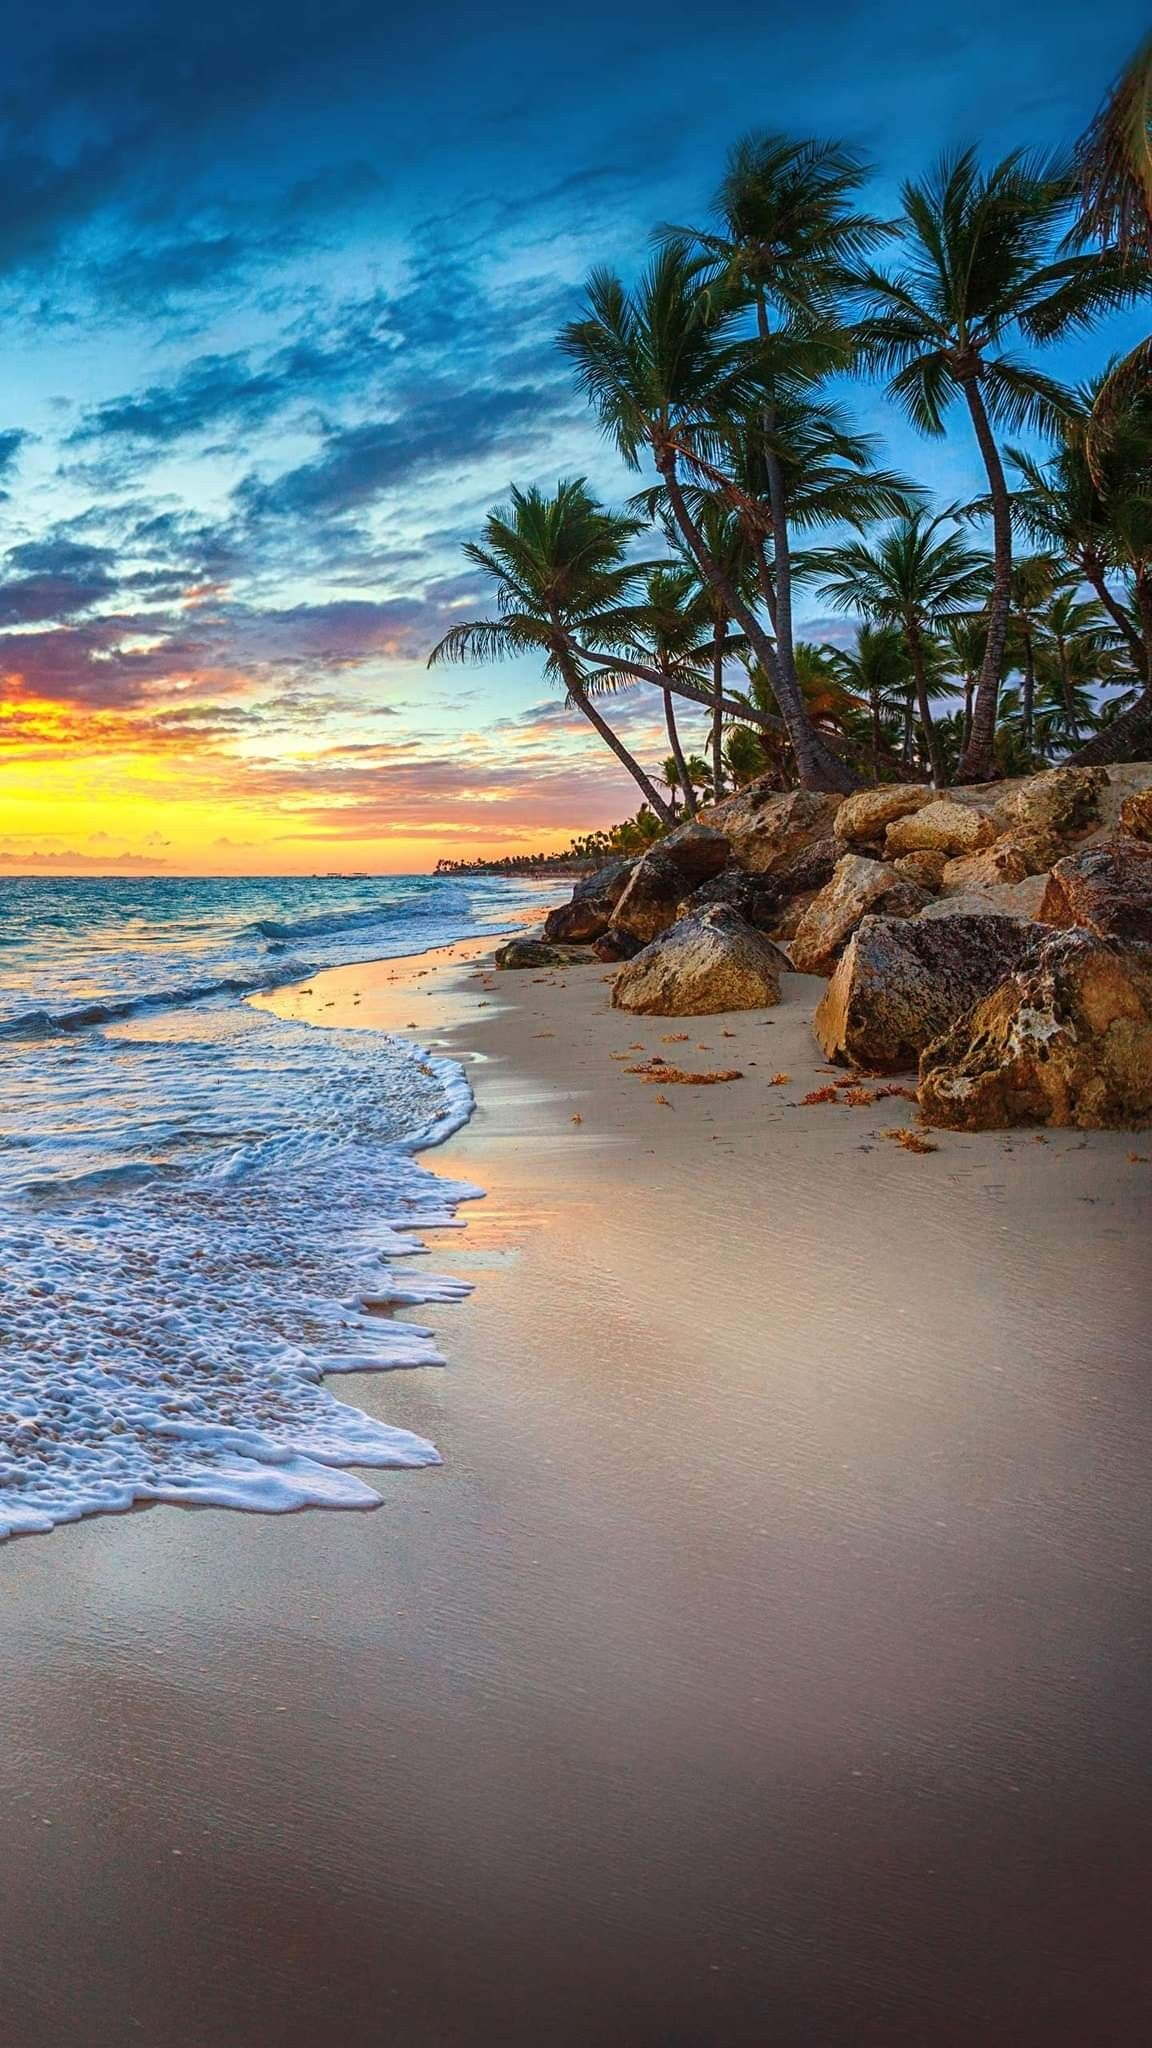 Sunset Beach | Beach landscape, Beautiful beach pictures ...